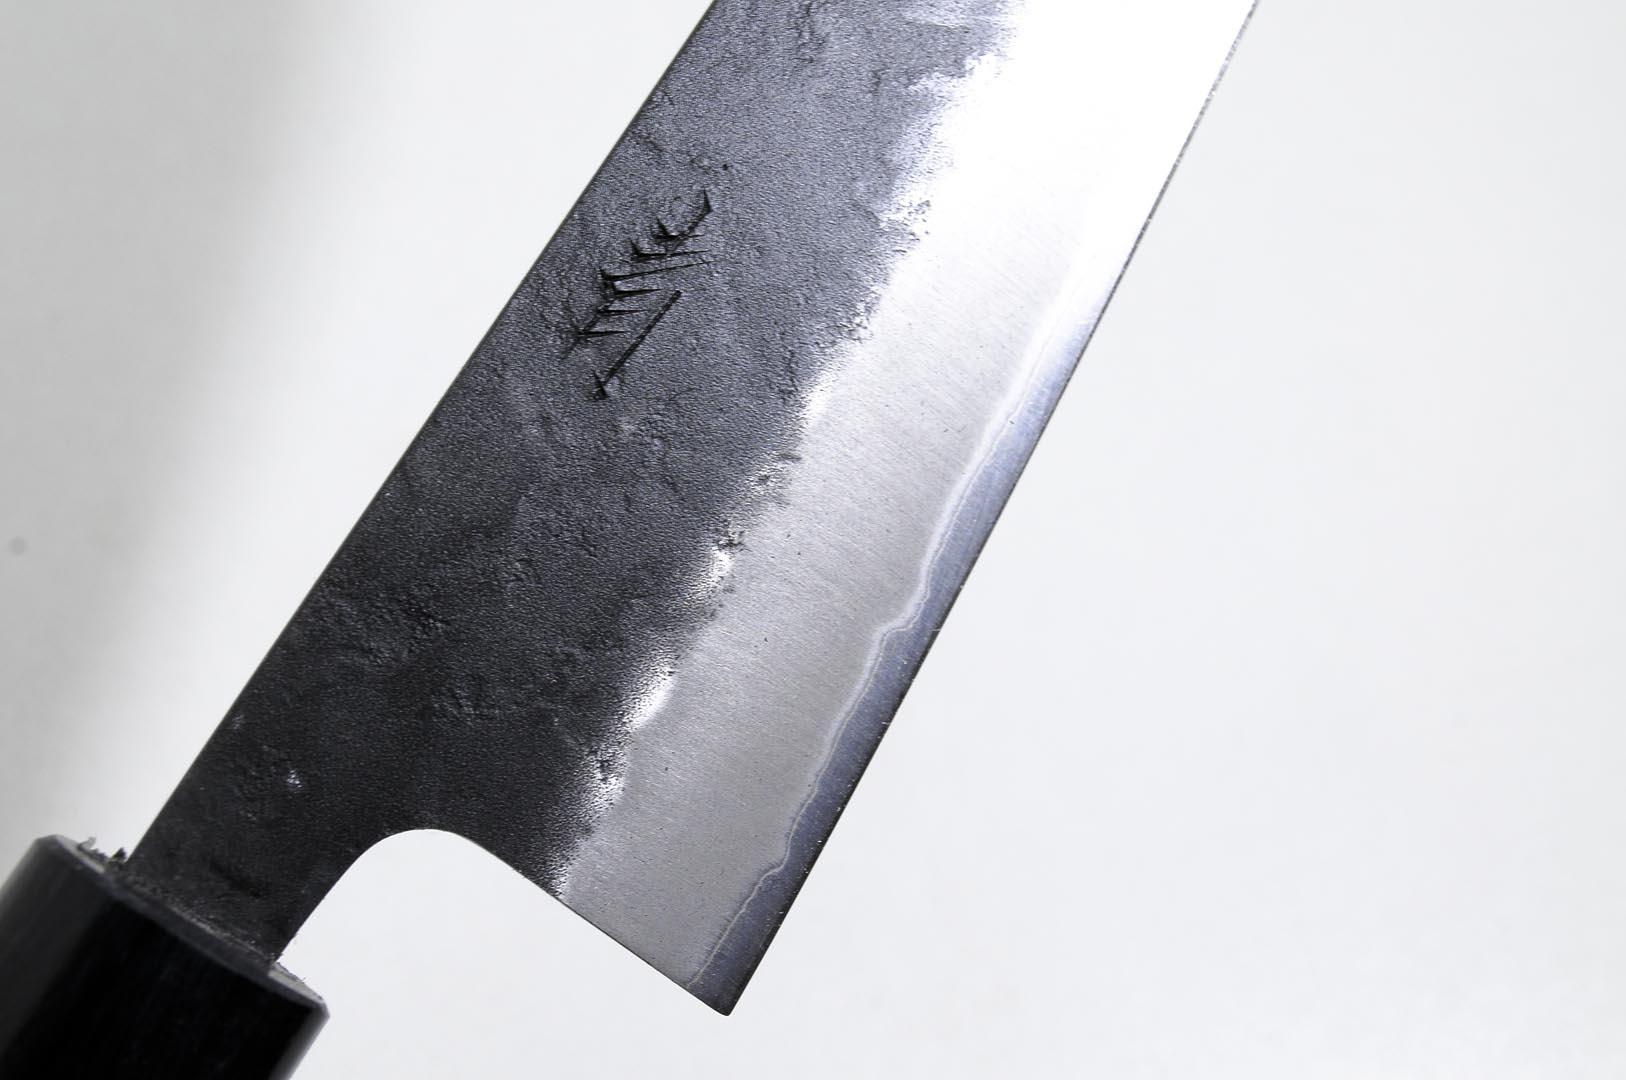 BS-16929-Cuchillo Gyuto 21cm Aogami Blue Super+clad inox Kurouchi BS-16929-max-4.